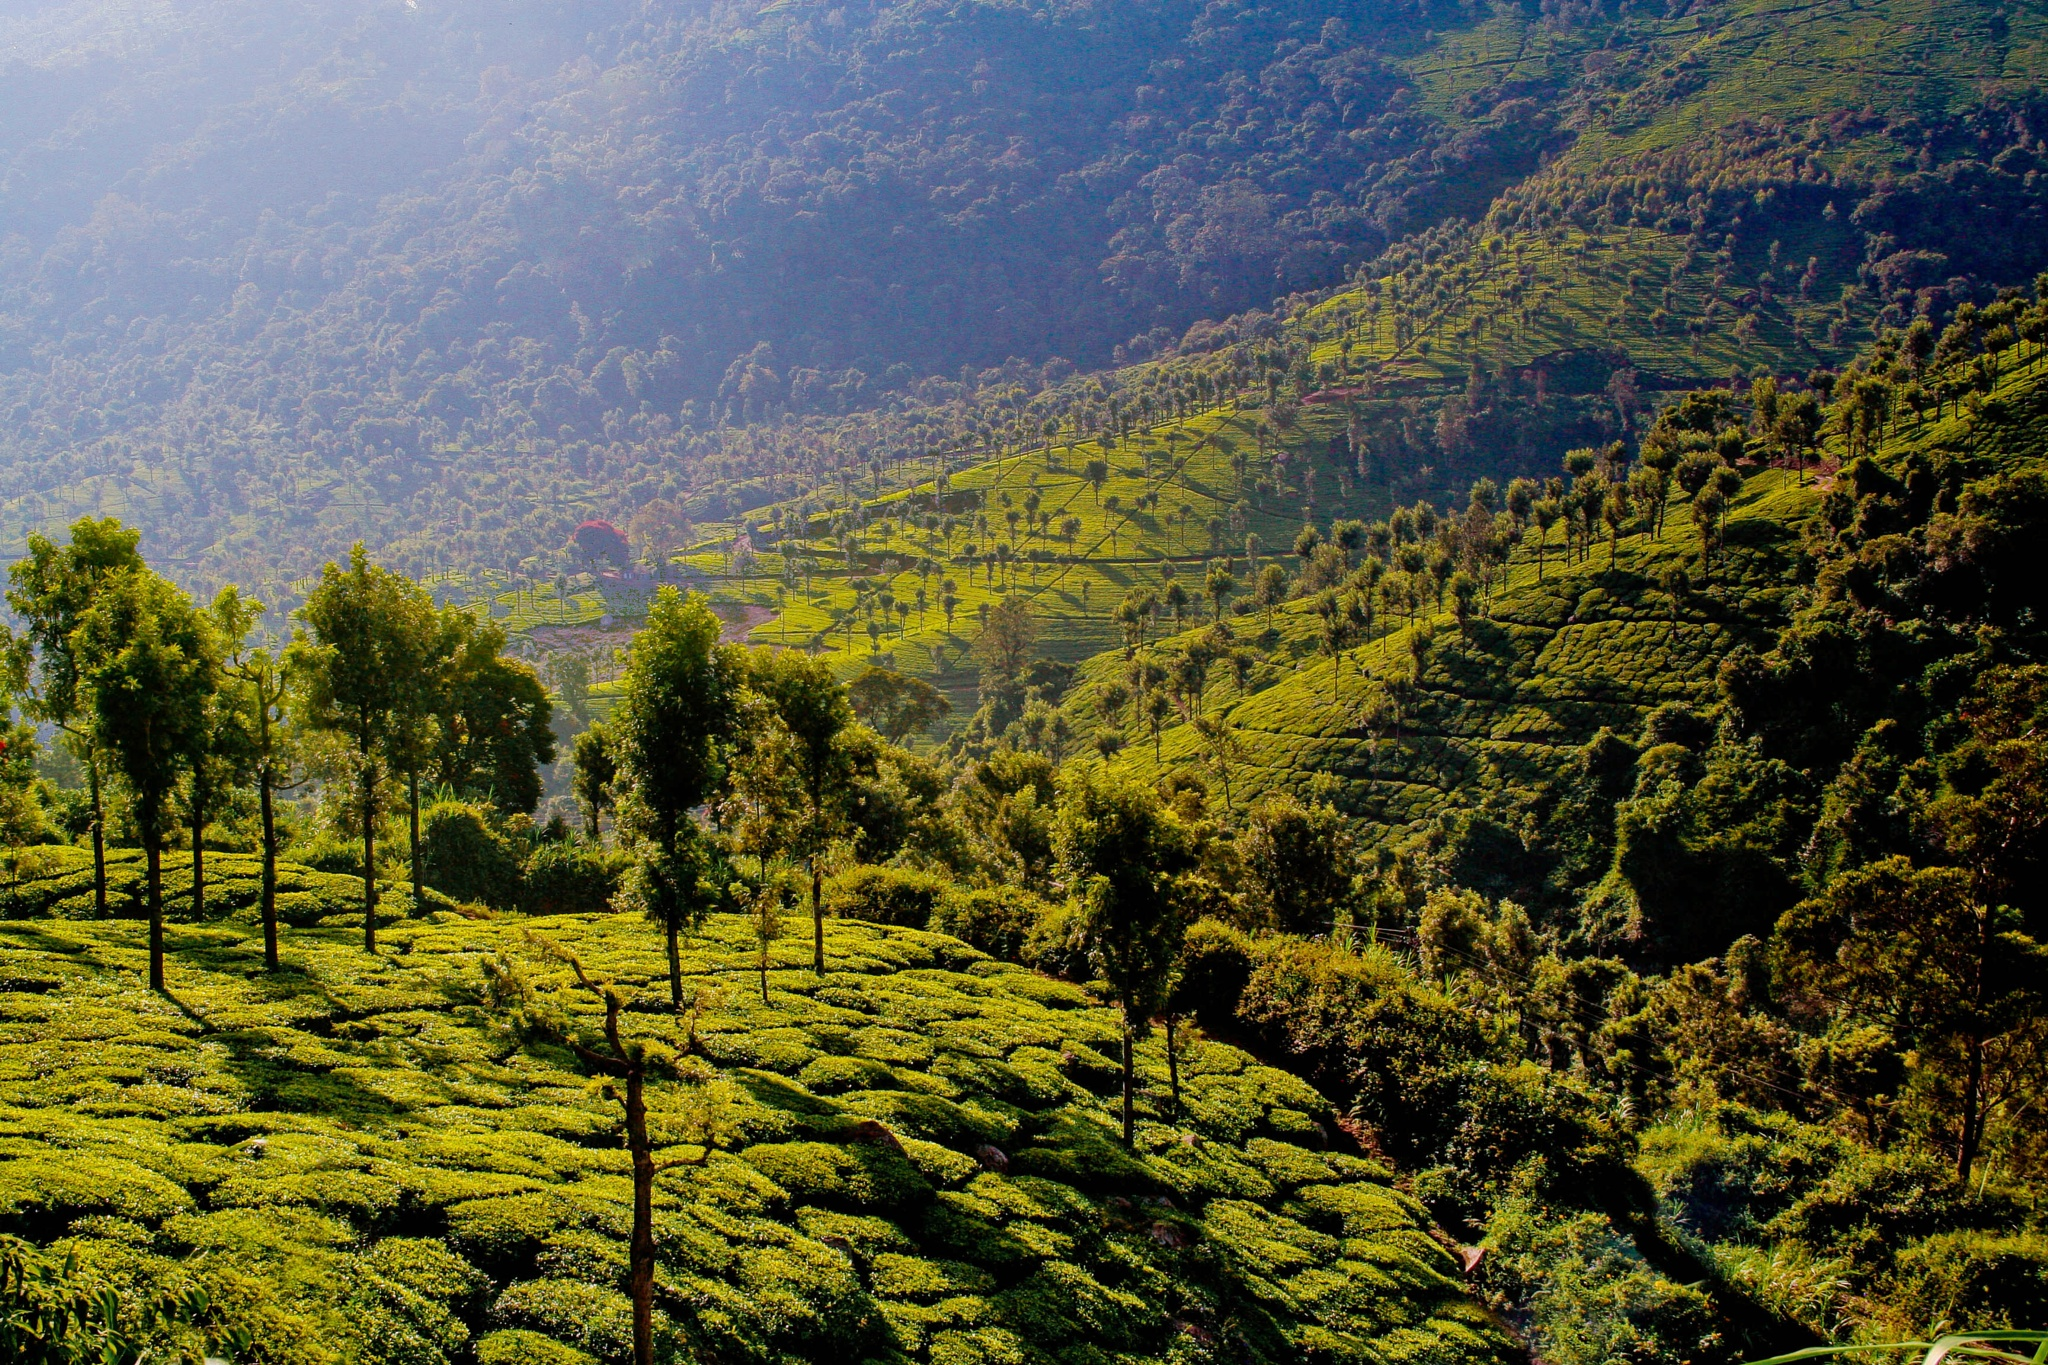 Tea garden by Mahul milan Mukherjee